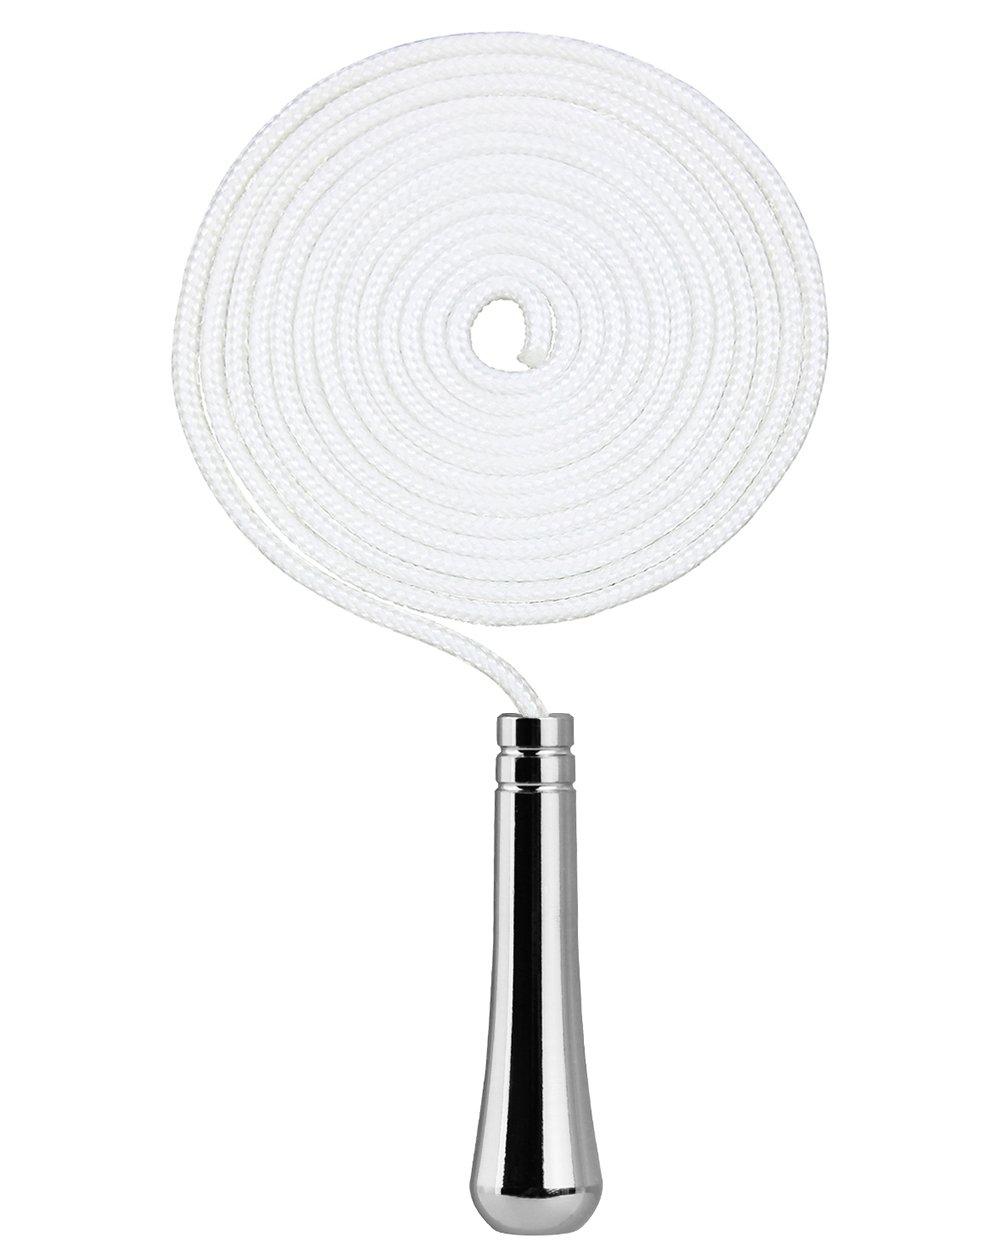 blau//anthrazit Best Sporting Hula Hoop Reifen 100 cm 6-teilig steckbar